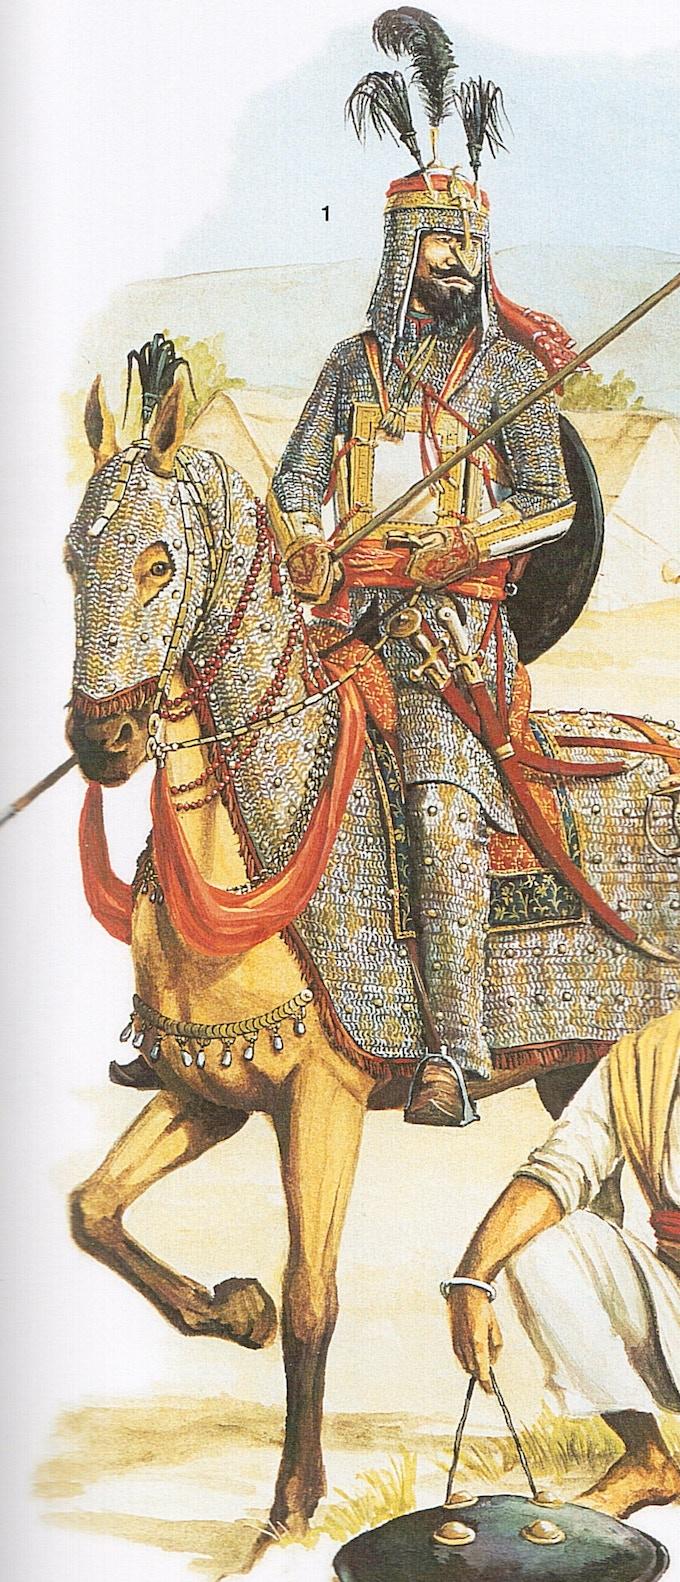 Sikh Ghorchurra by M. Perry. Copyright Osprey Publishing Ltd